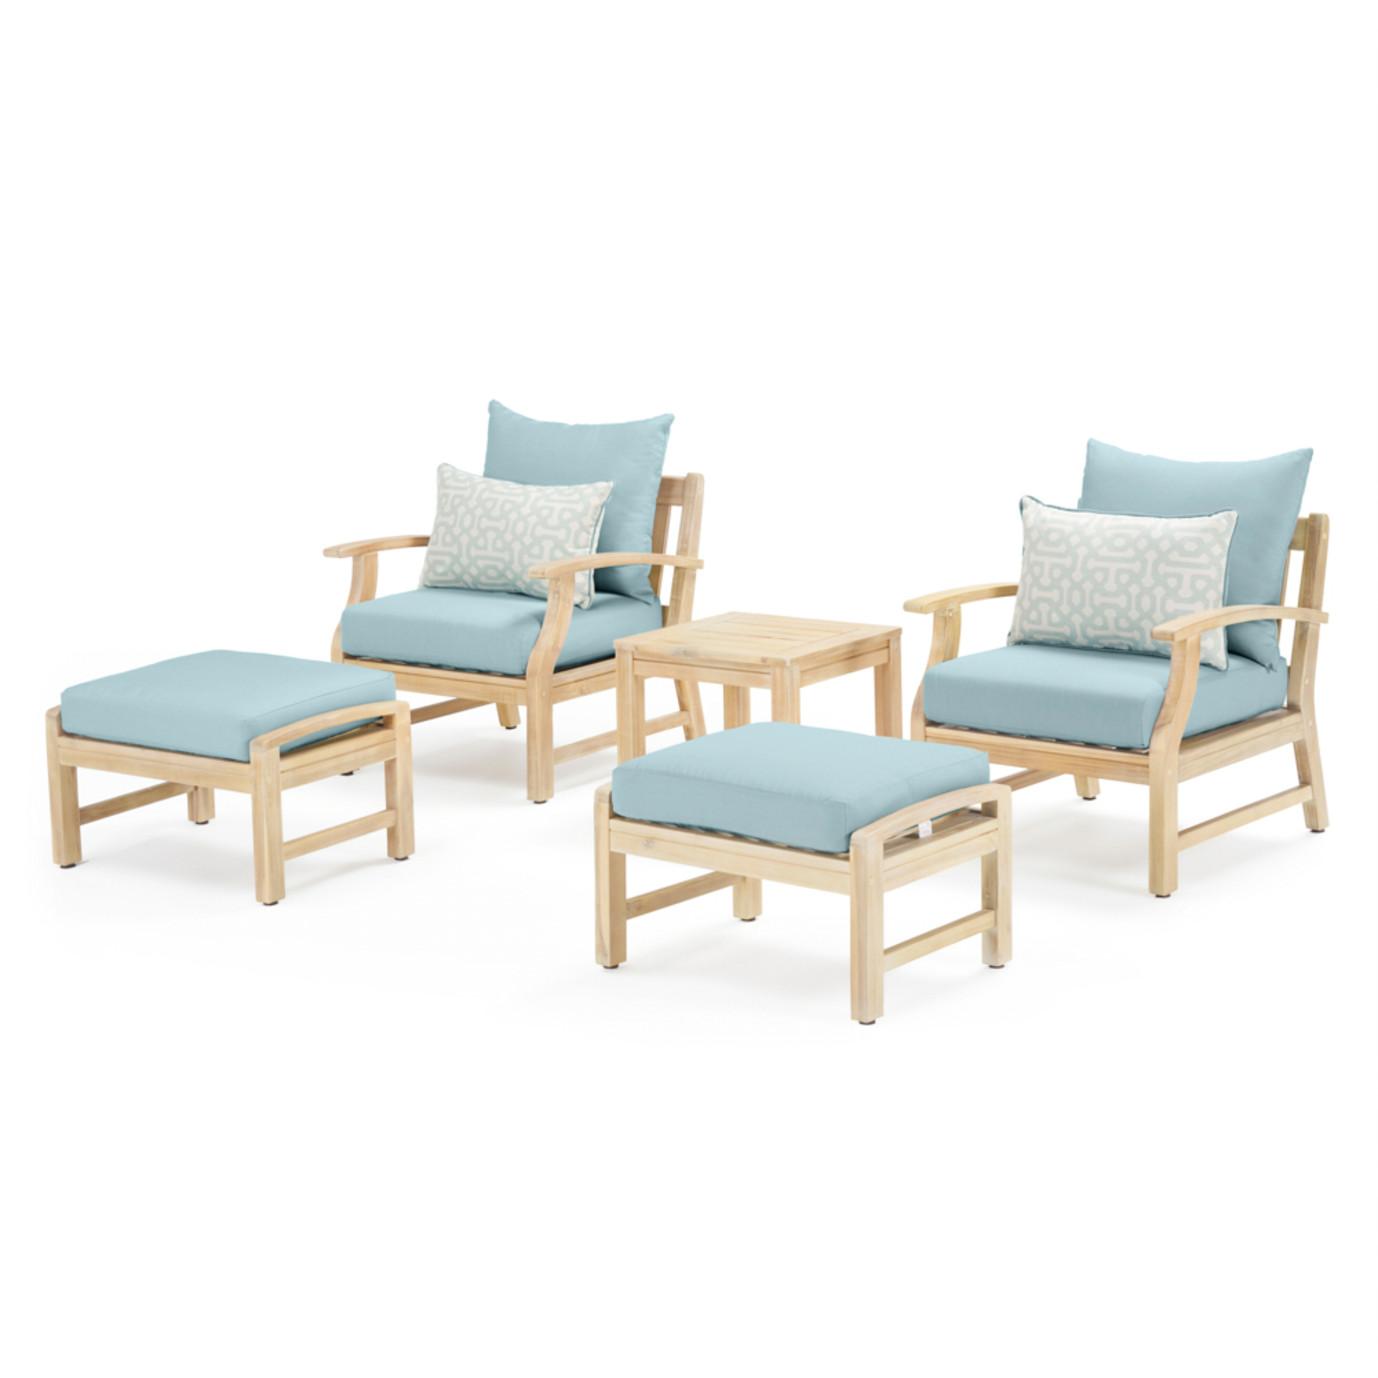 Kooper 5 Piece Club Chair & Ottoman Set - Spa Blue